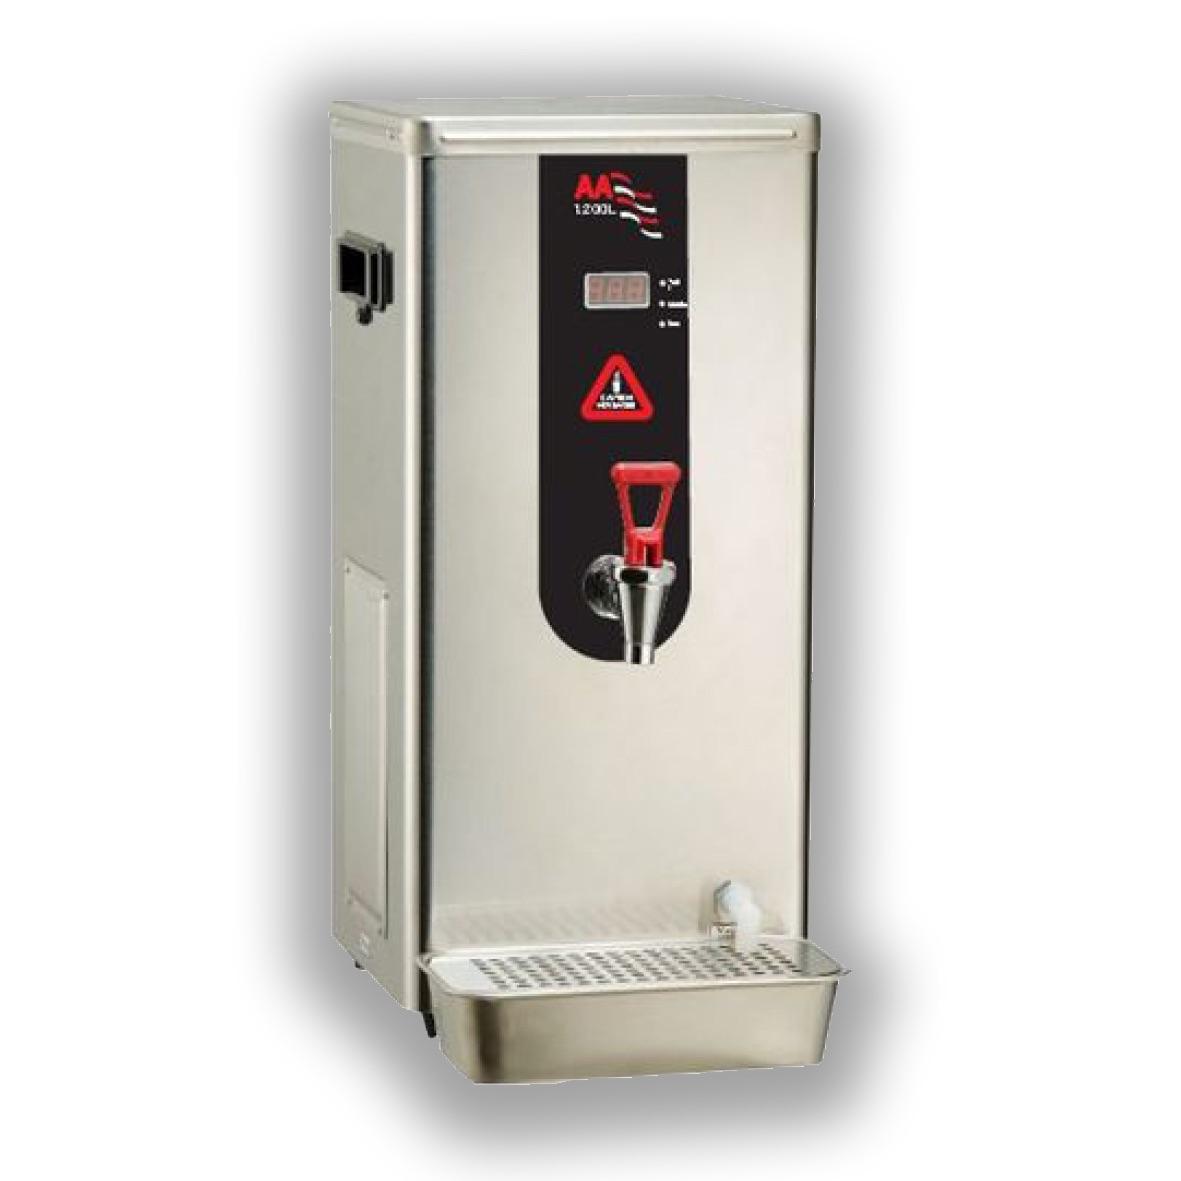 A1200 Water Boiler